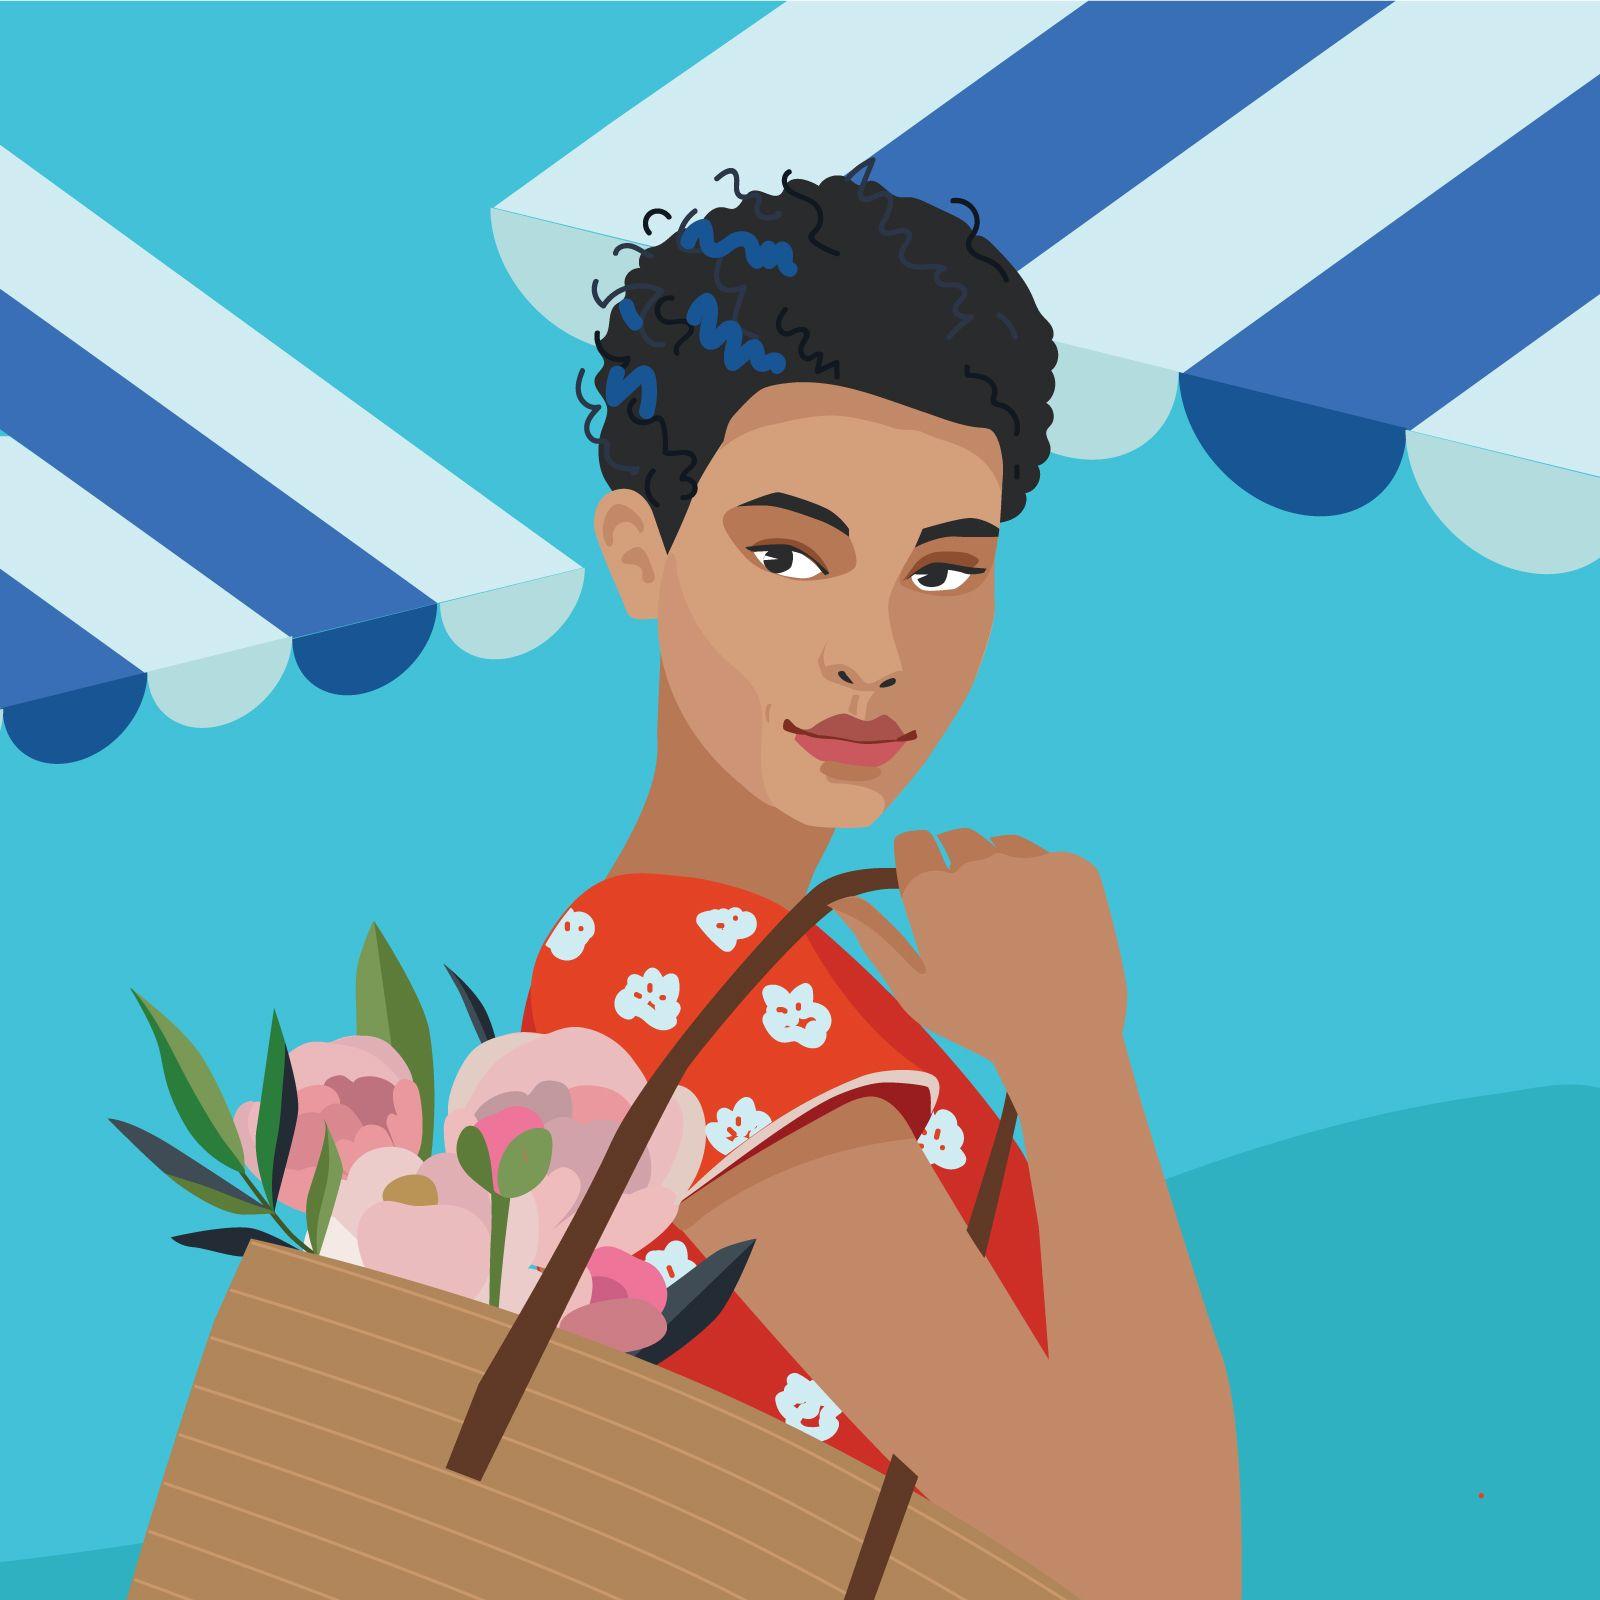 garance-illustration-Irina-Kruglova-Procter-Gamble-All-Natural-_-Play-It-Coil_female